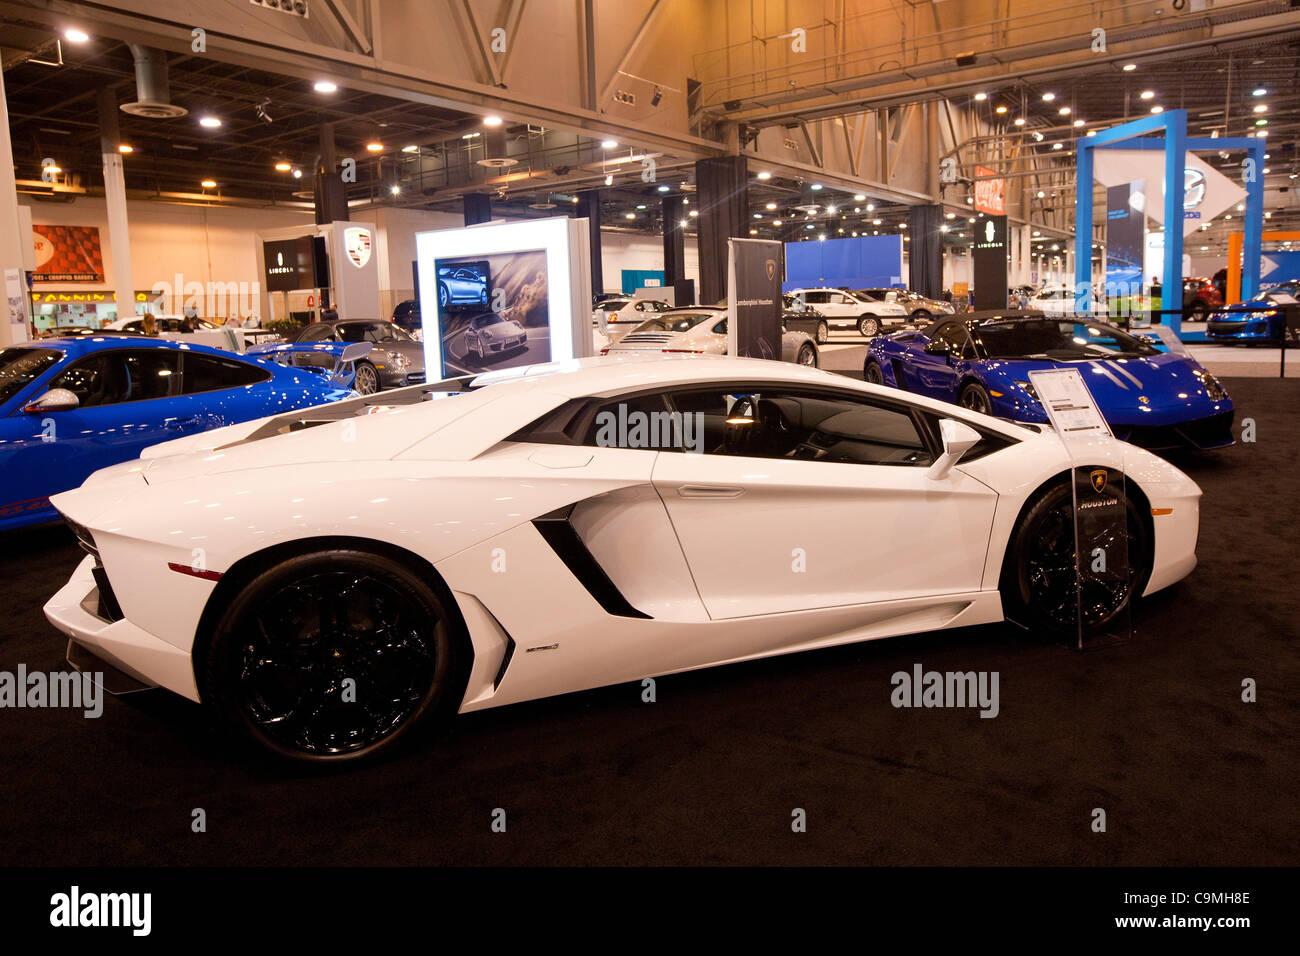 Jan 25 2012 Houston Texas U S 2012 Lamborghini Aventador